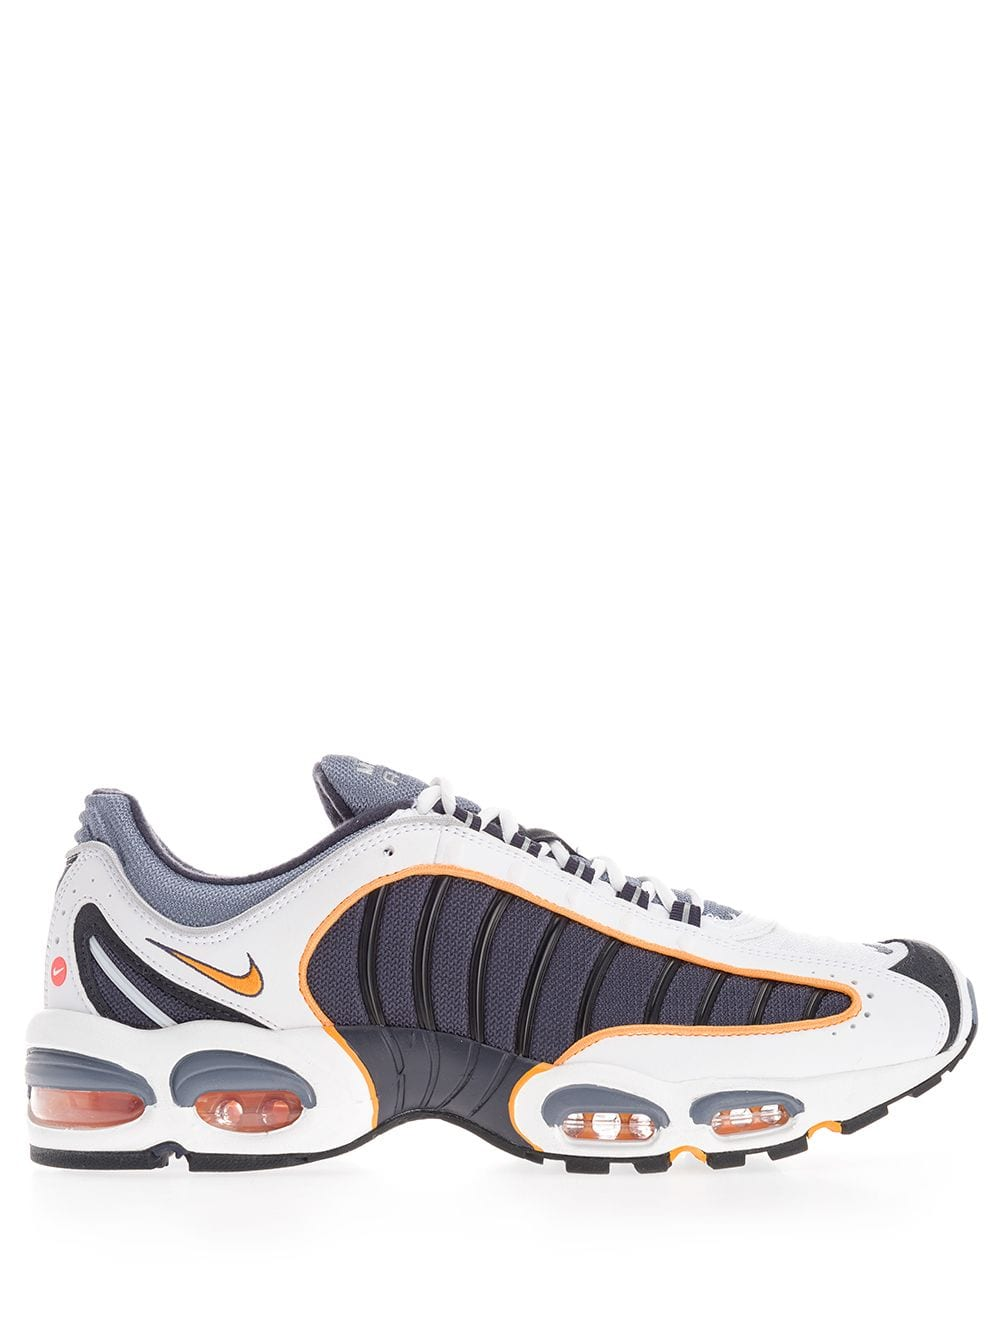 Supreme x Nike Air Max Tailwind 4 White Grailify Sneaker